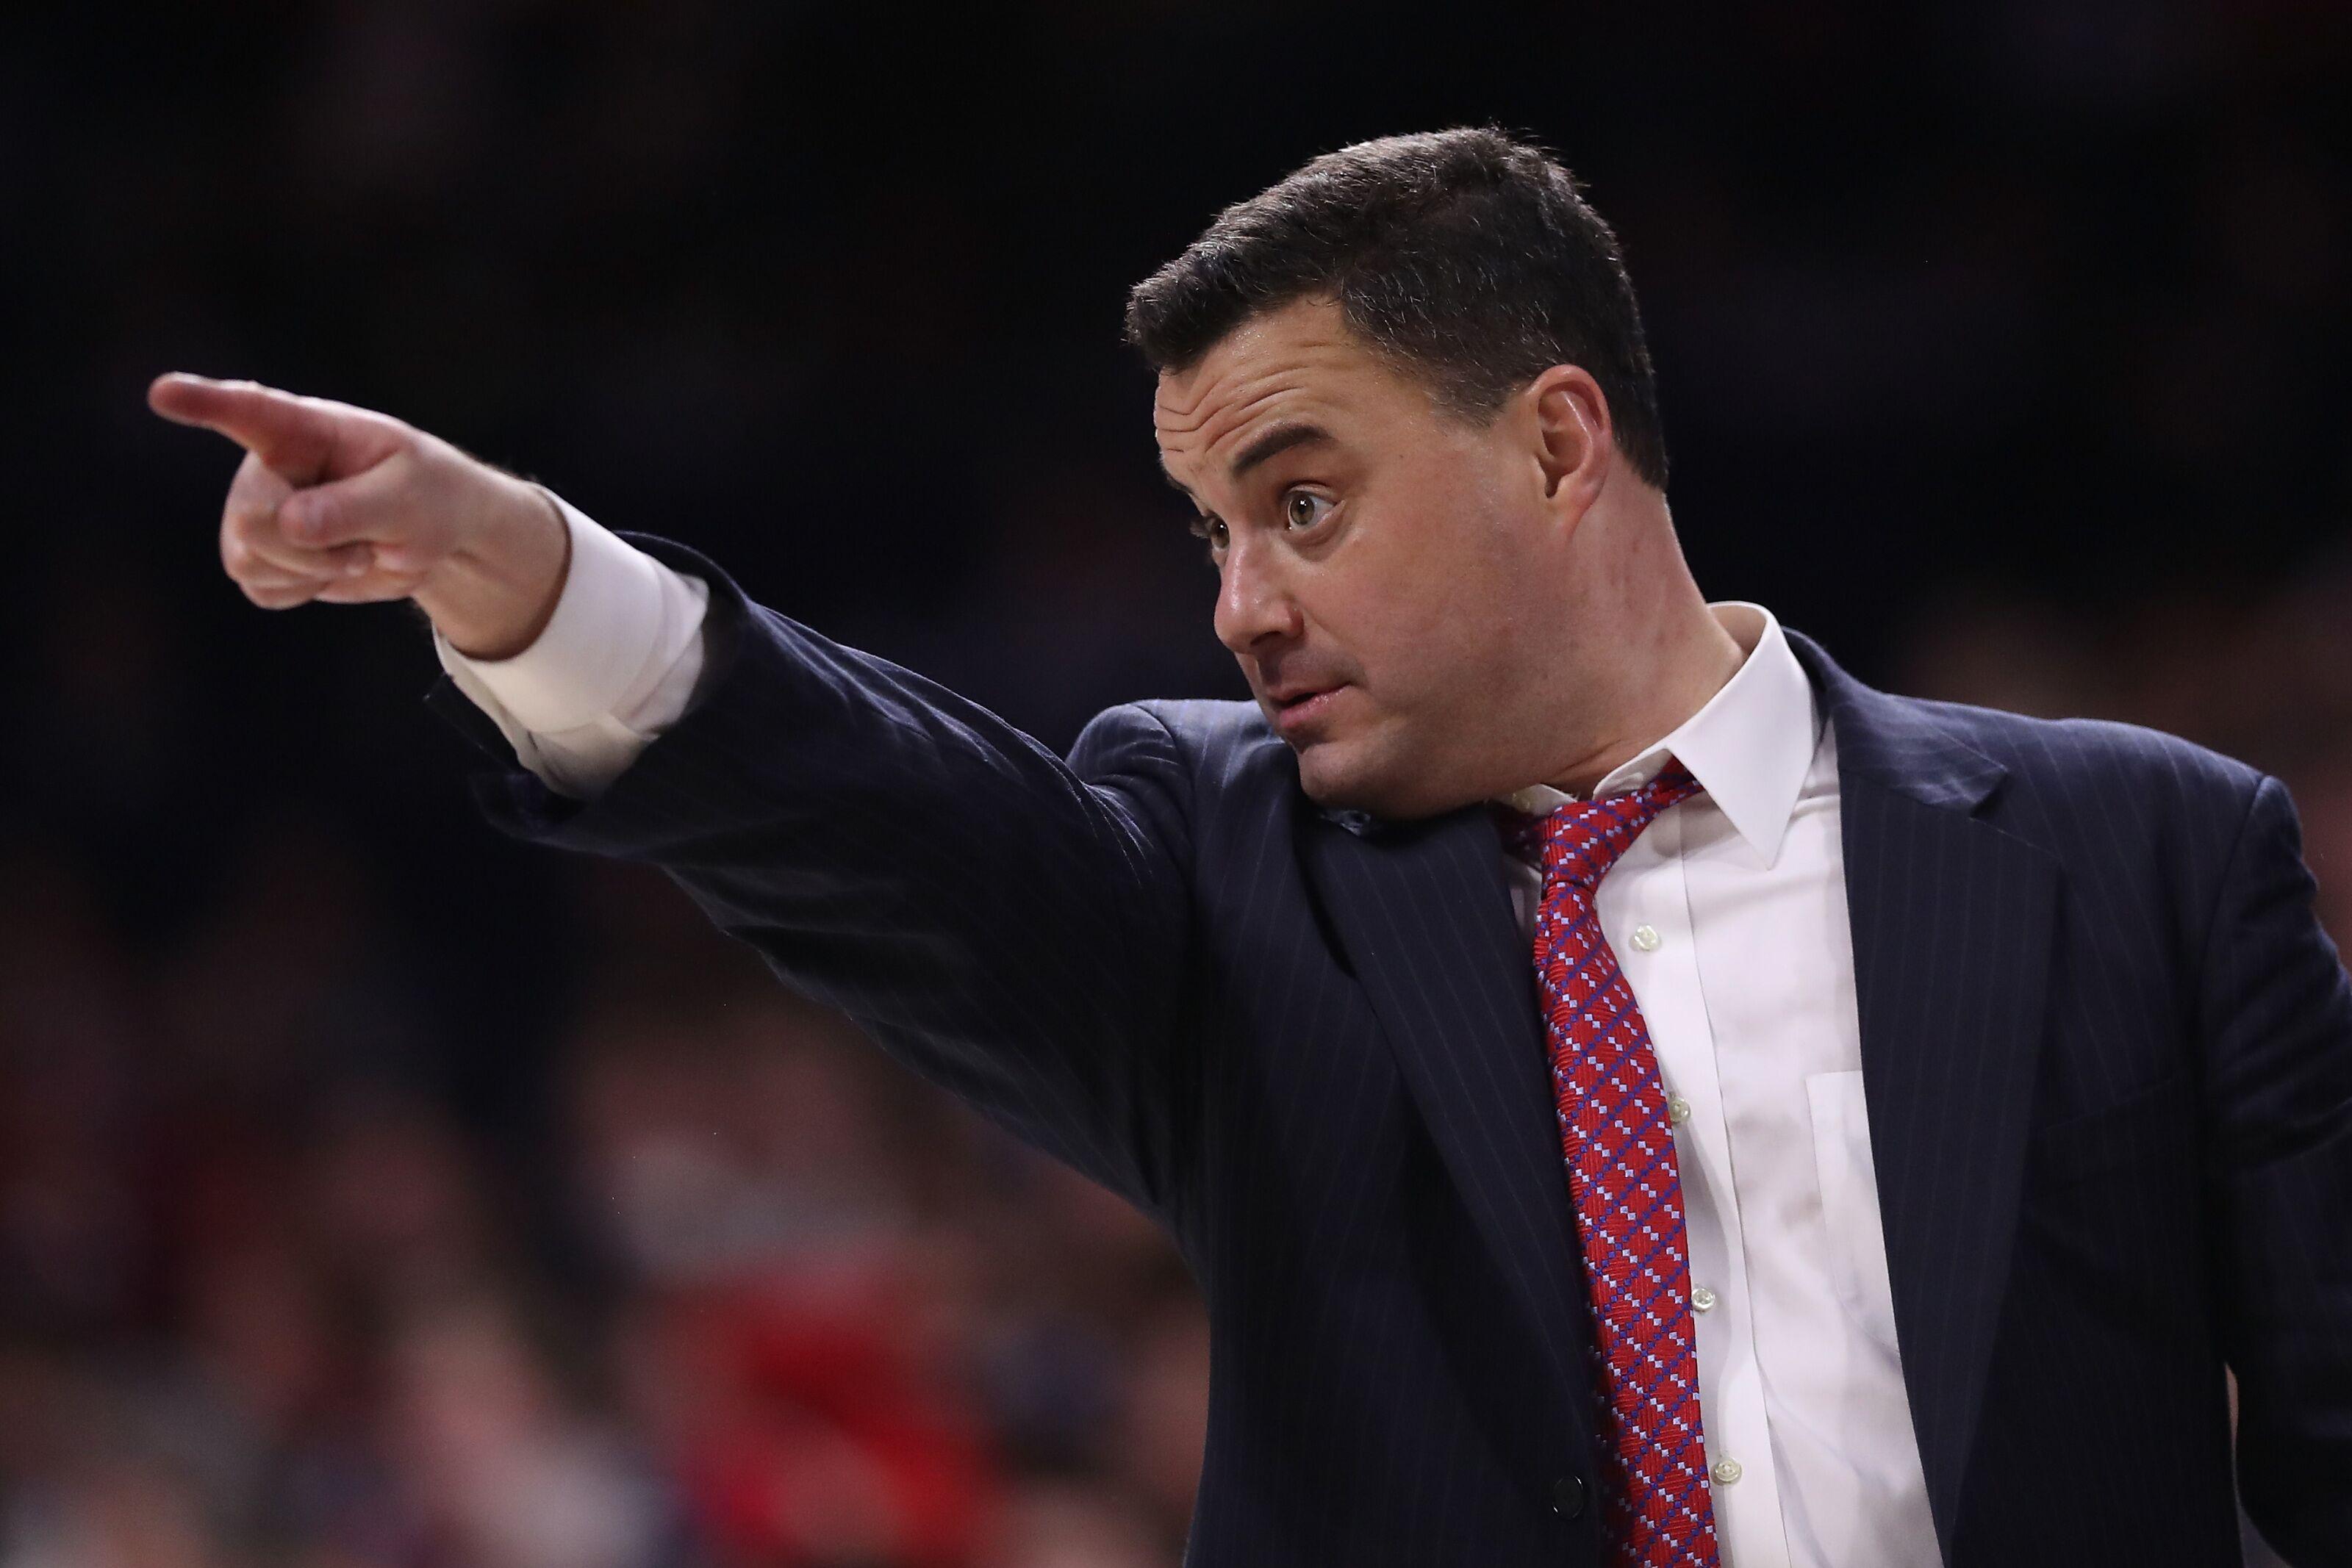 Arizona Basketball: Four-star Peyton Watson has Arizona's attention